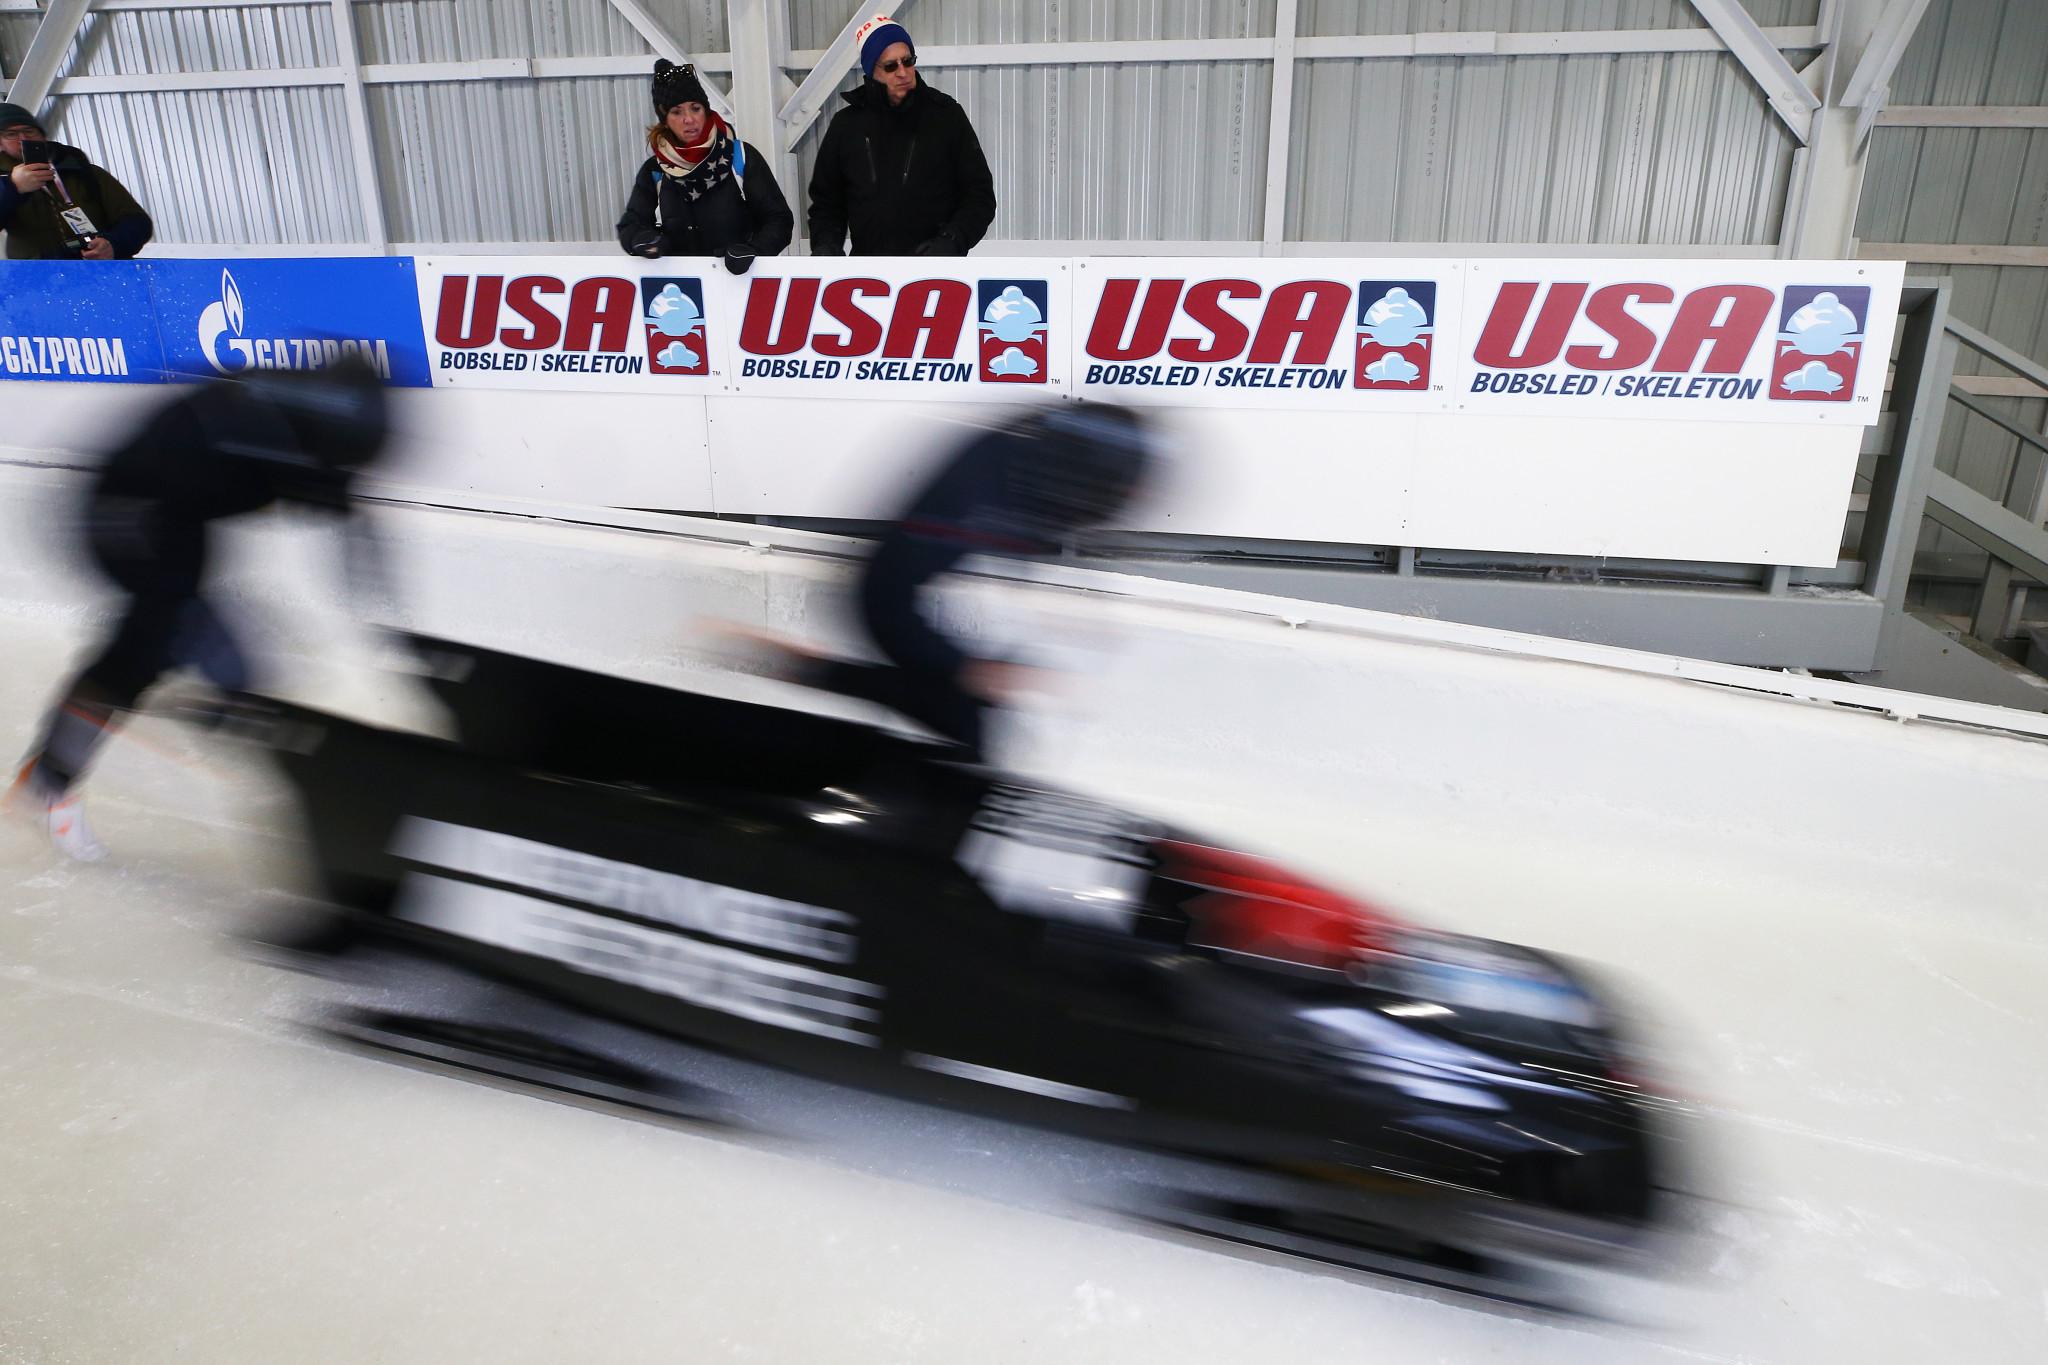 USA bobsleigh and skeleton teams to skip first half of season despite IBSF's calendar adjustments